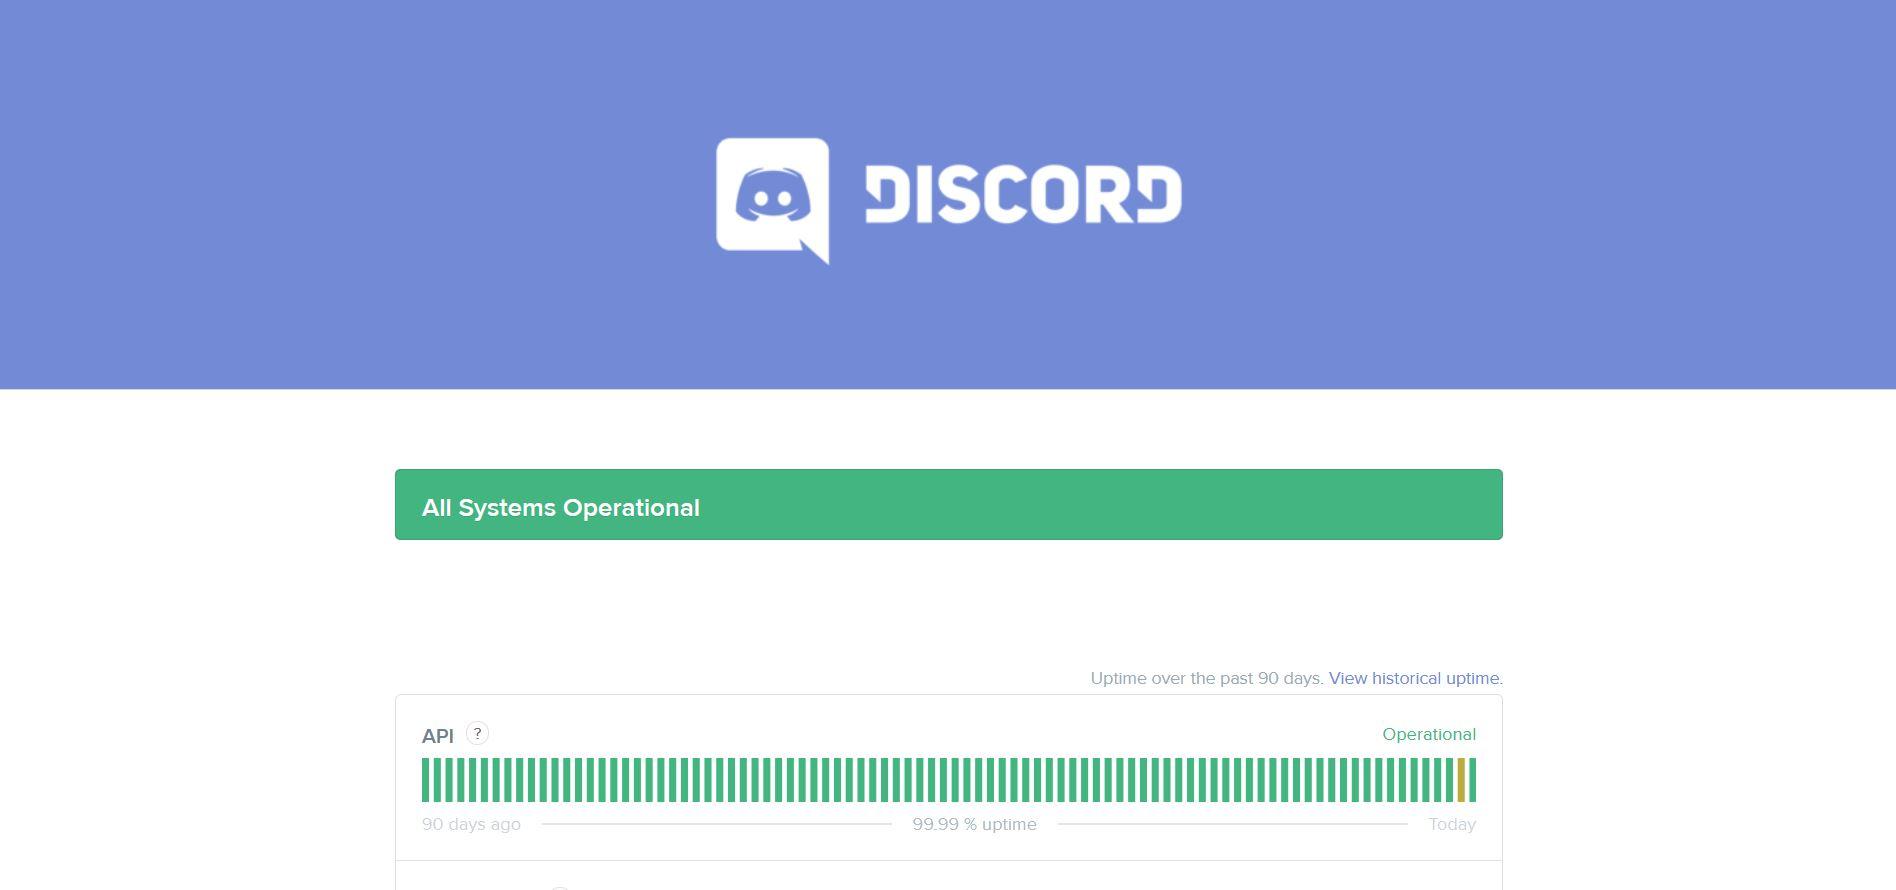 serveurs-status-discord-bug-probleme-connexion